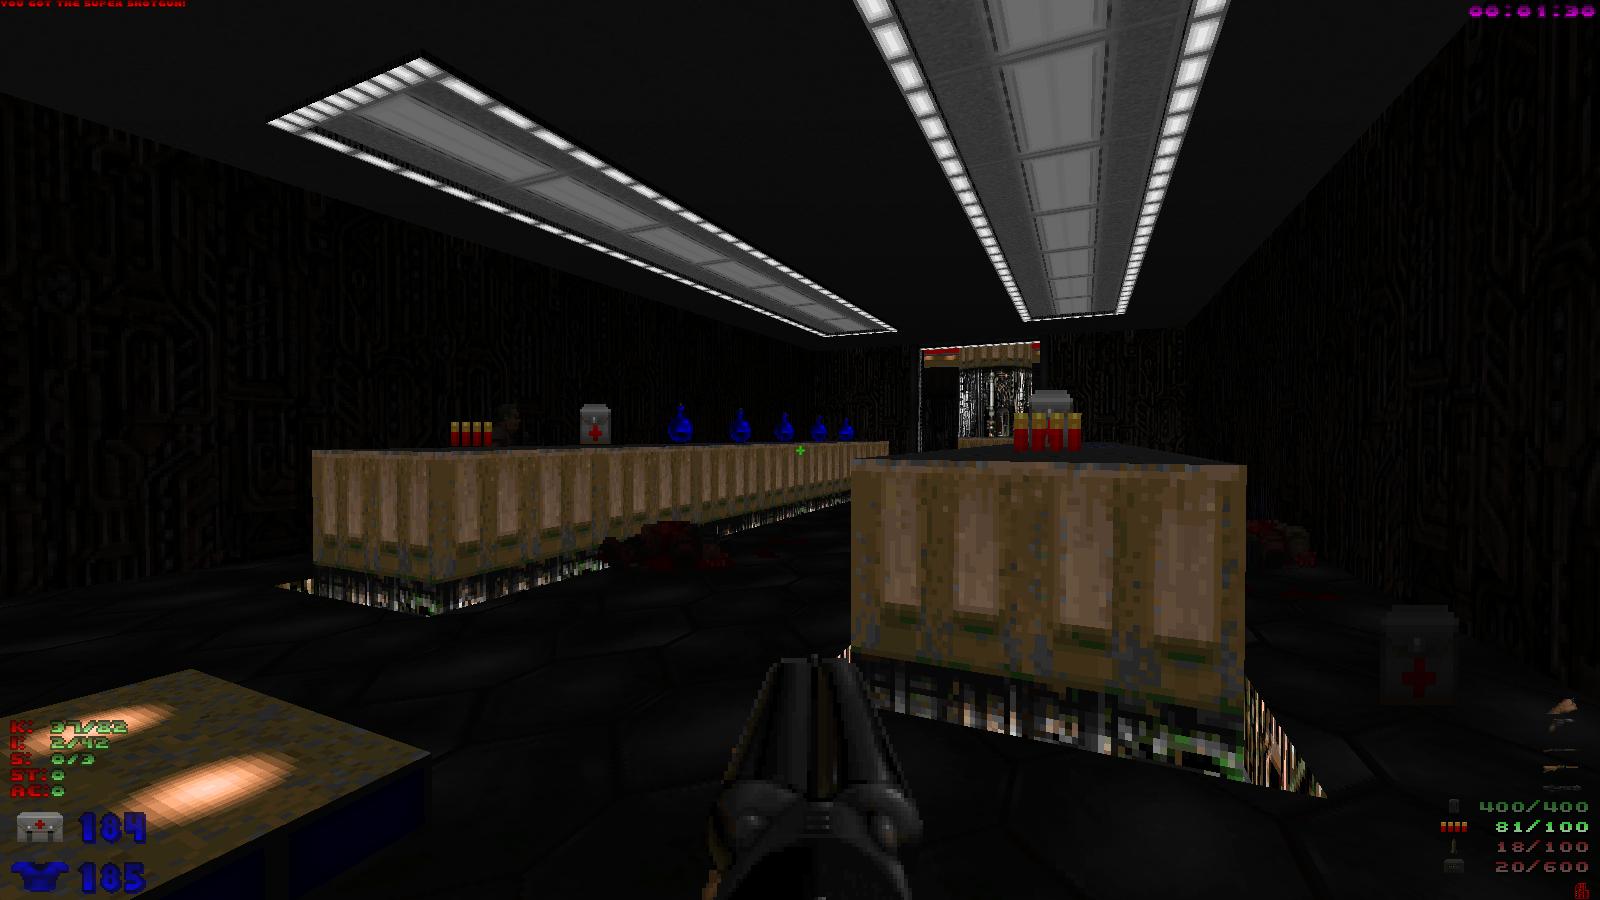 Screenshot_Doom_20190807_202709.png.8ad9d320b255970403fcaff5c7ea436c.png